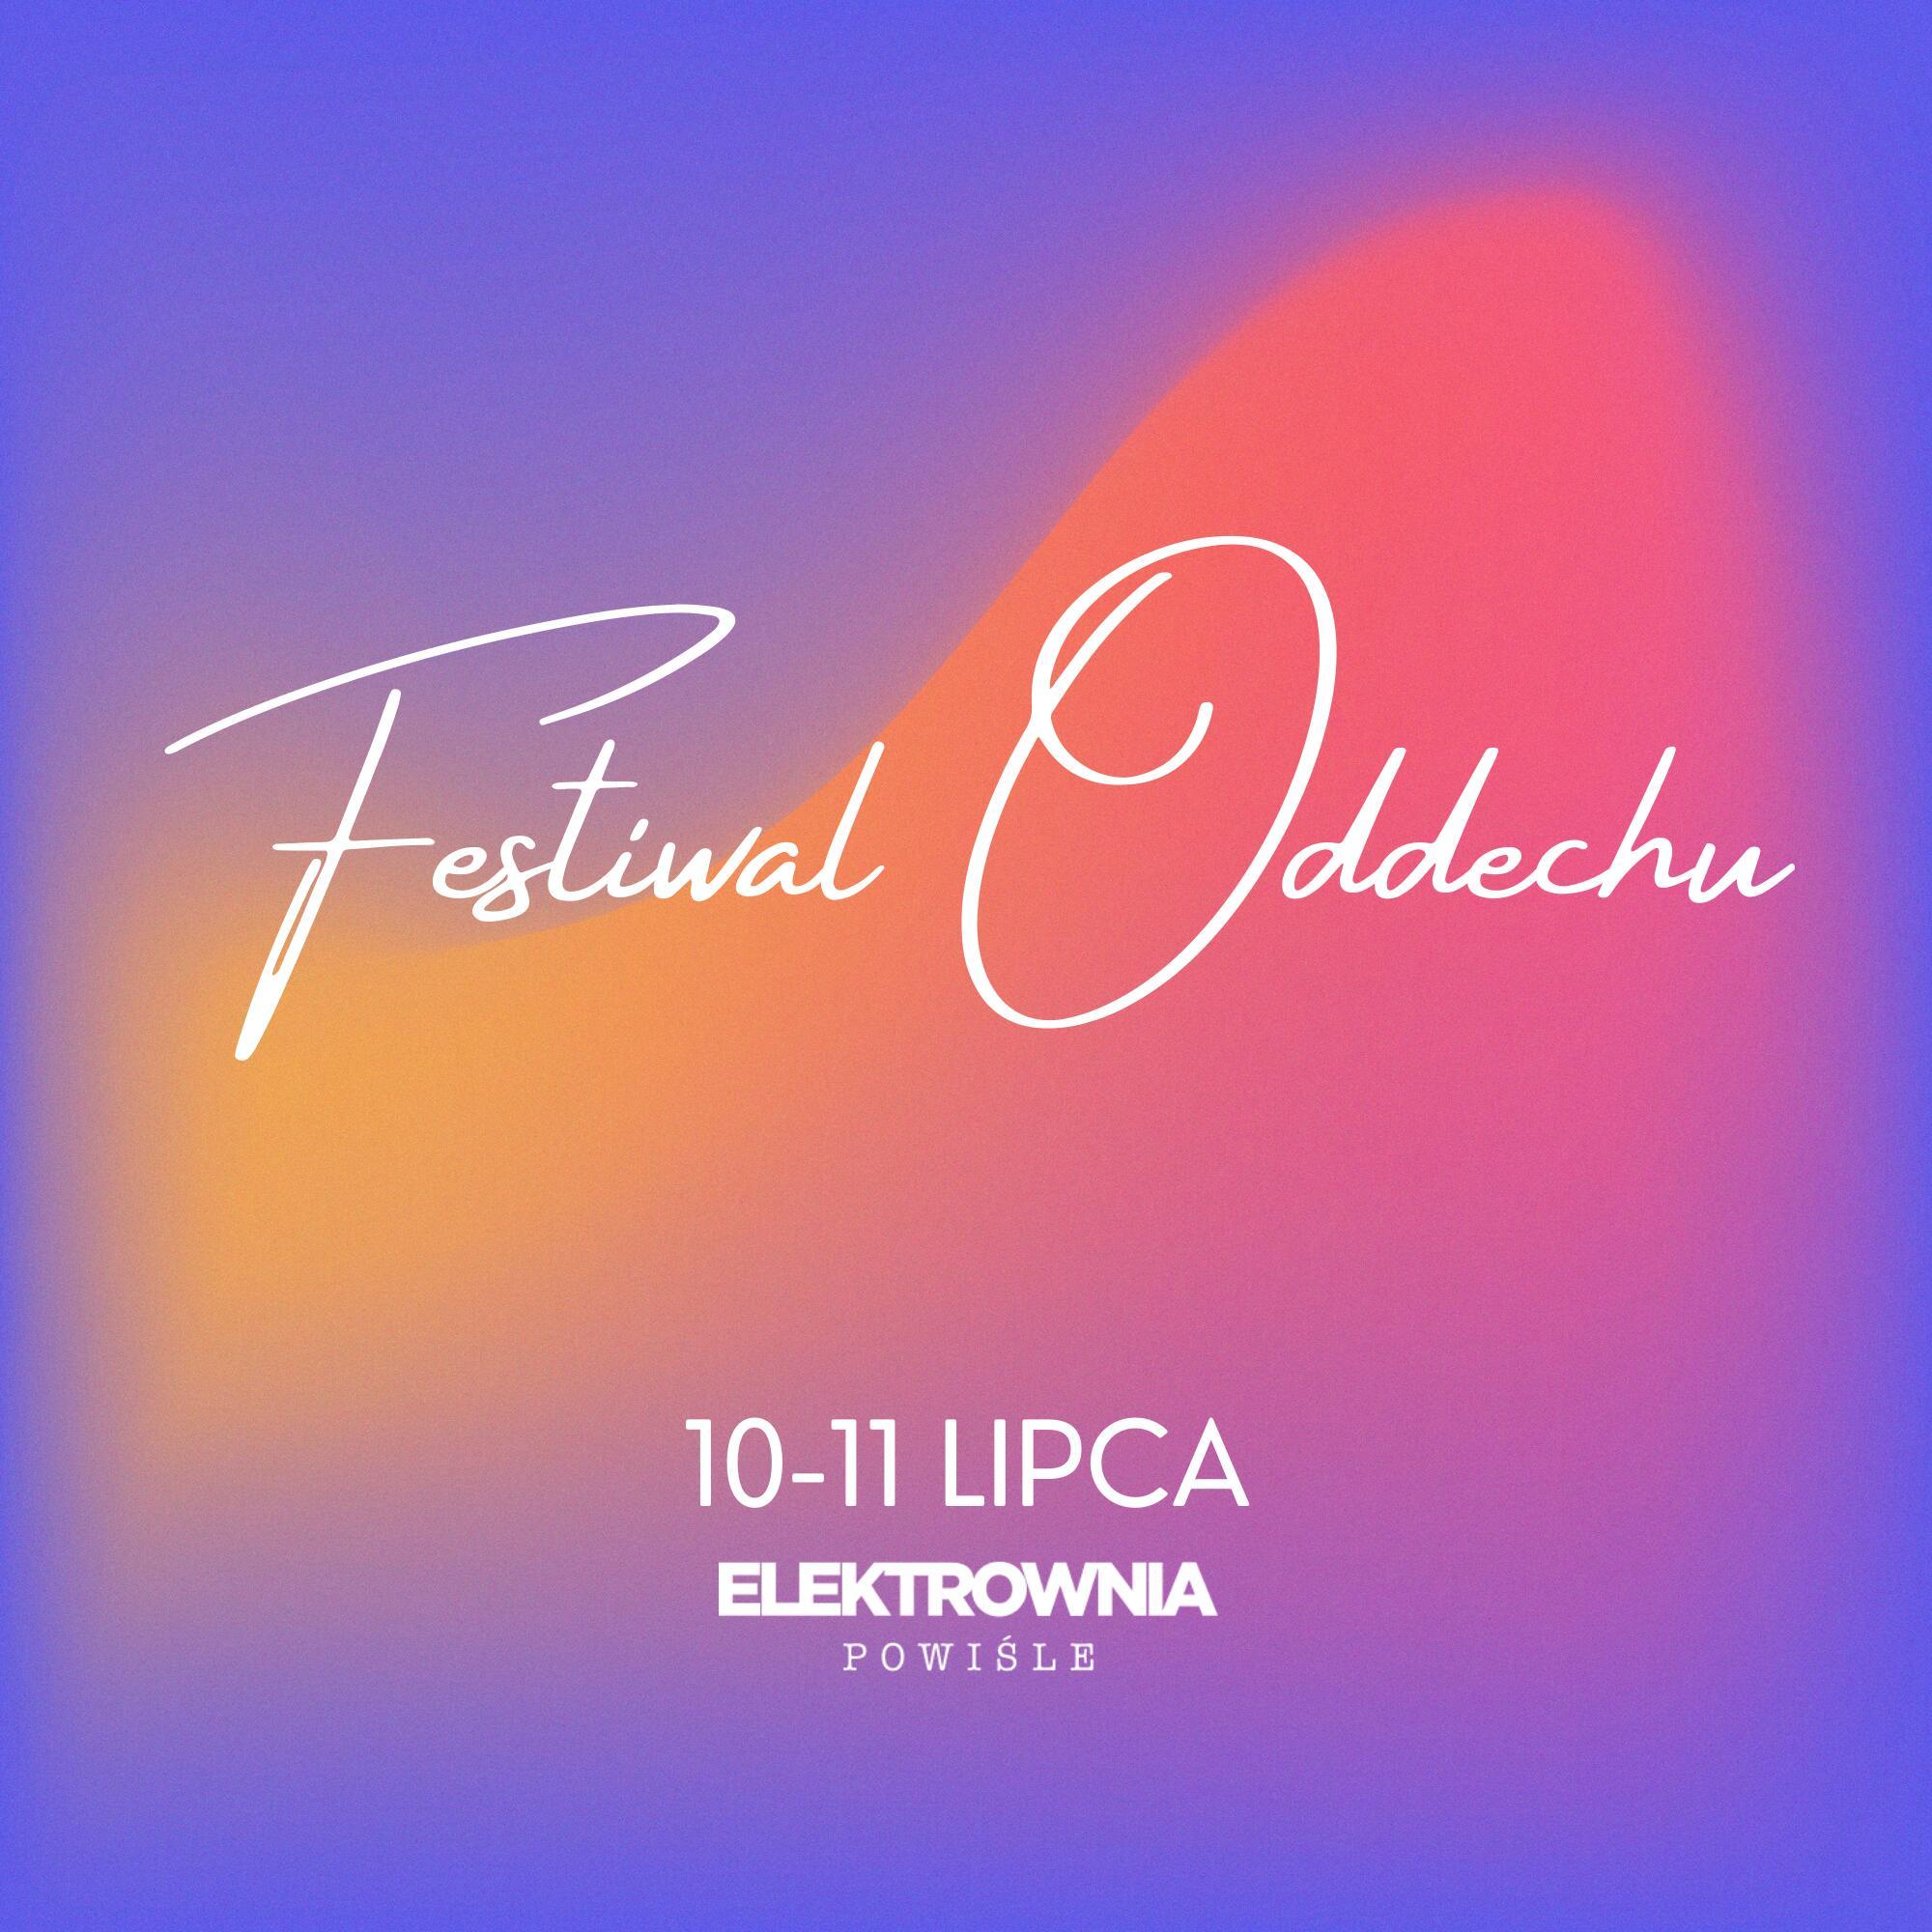 Bilet na Stretch & Release Festiwal Oddechu #1 - Festiwal Oddechu   JestemSlow.pl